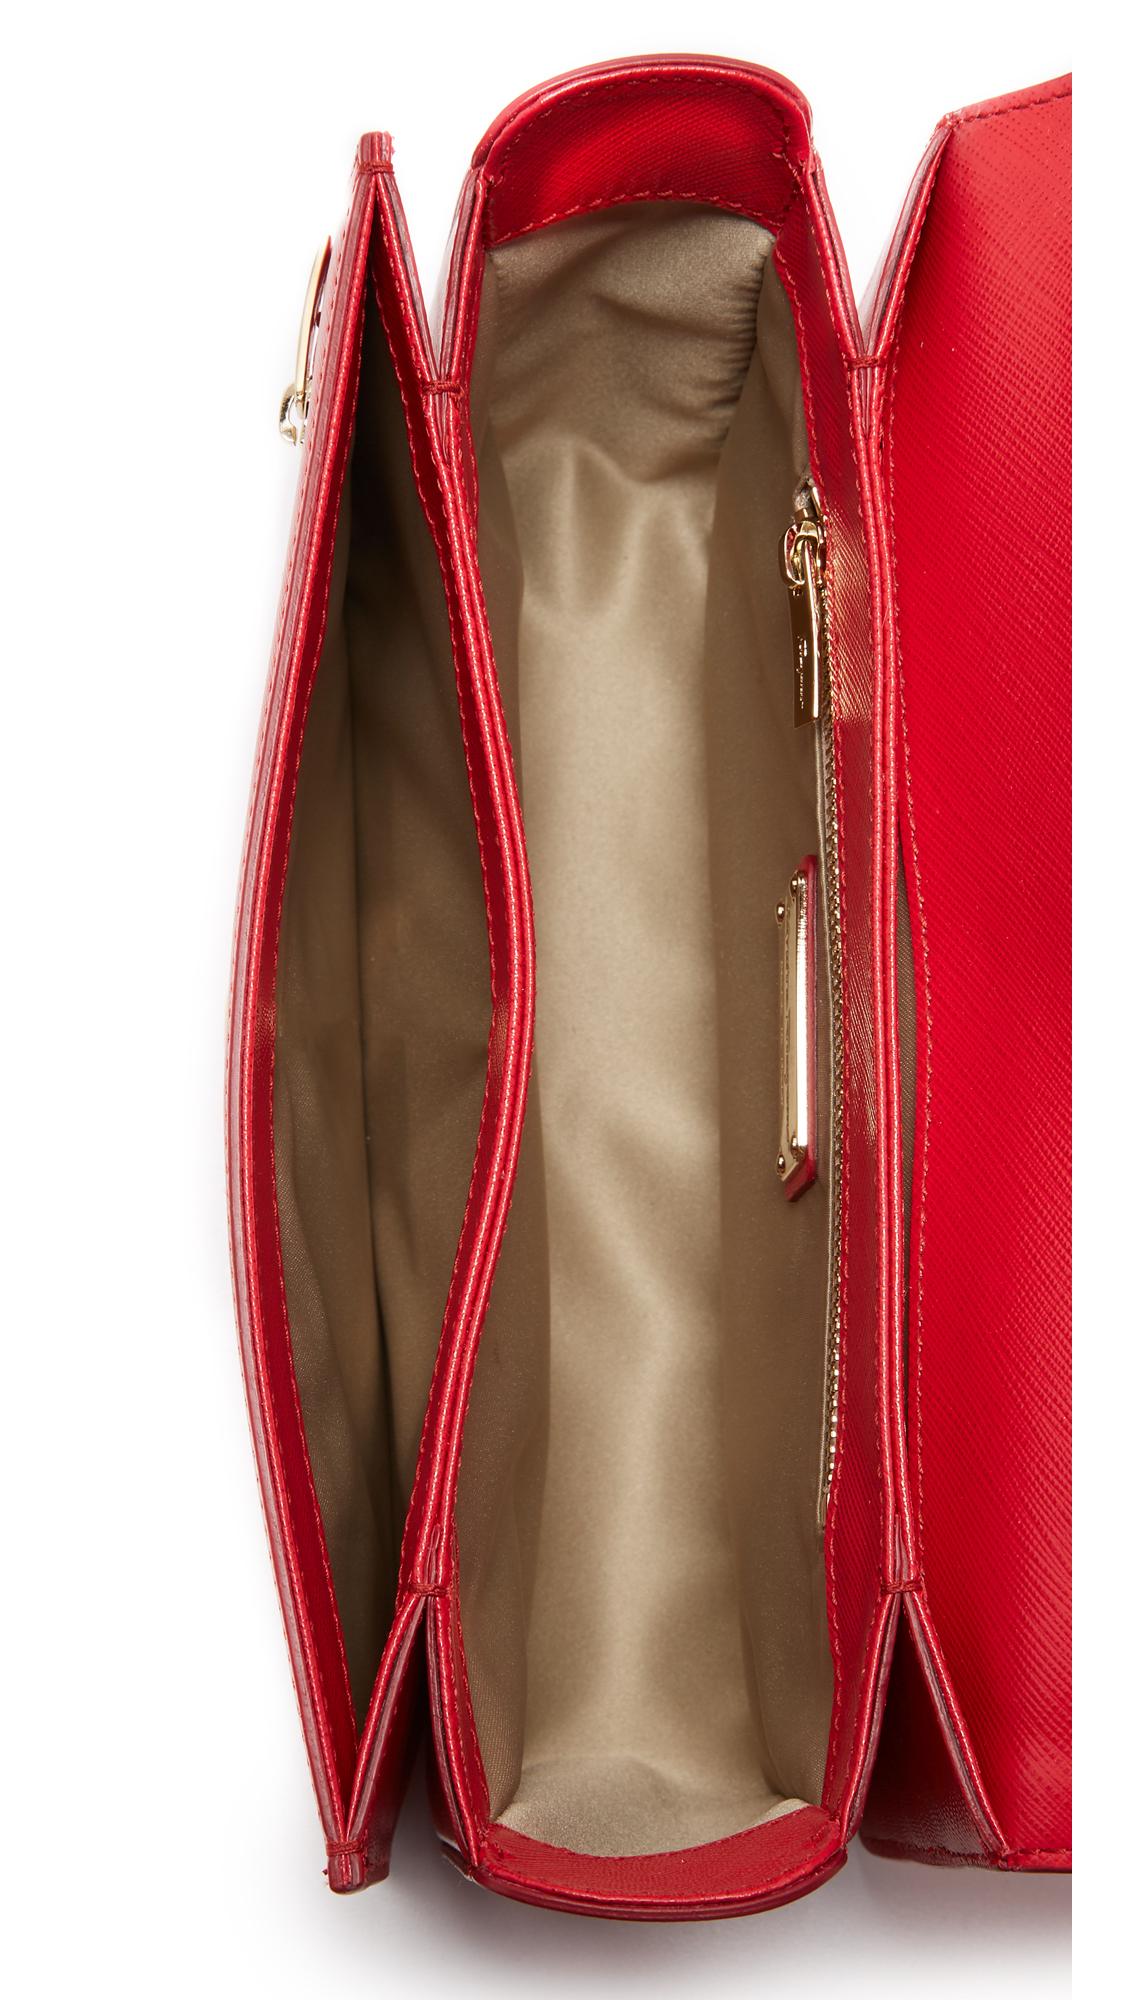 Salvatore Ferragamo Seila Mini Top Handle Bag  59dc5e2b8bc63